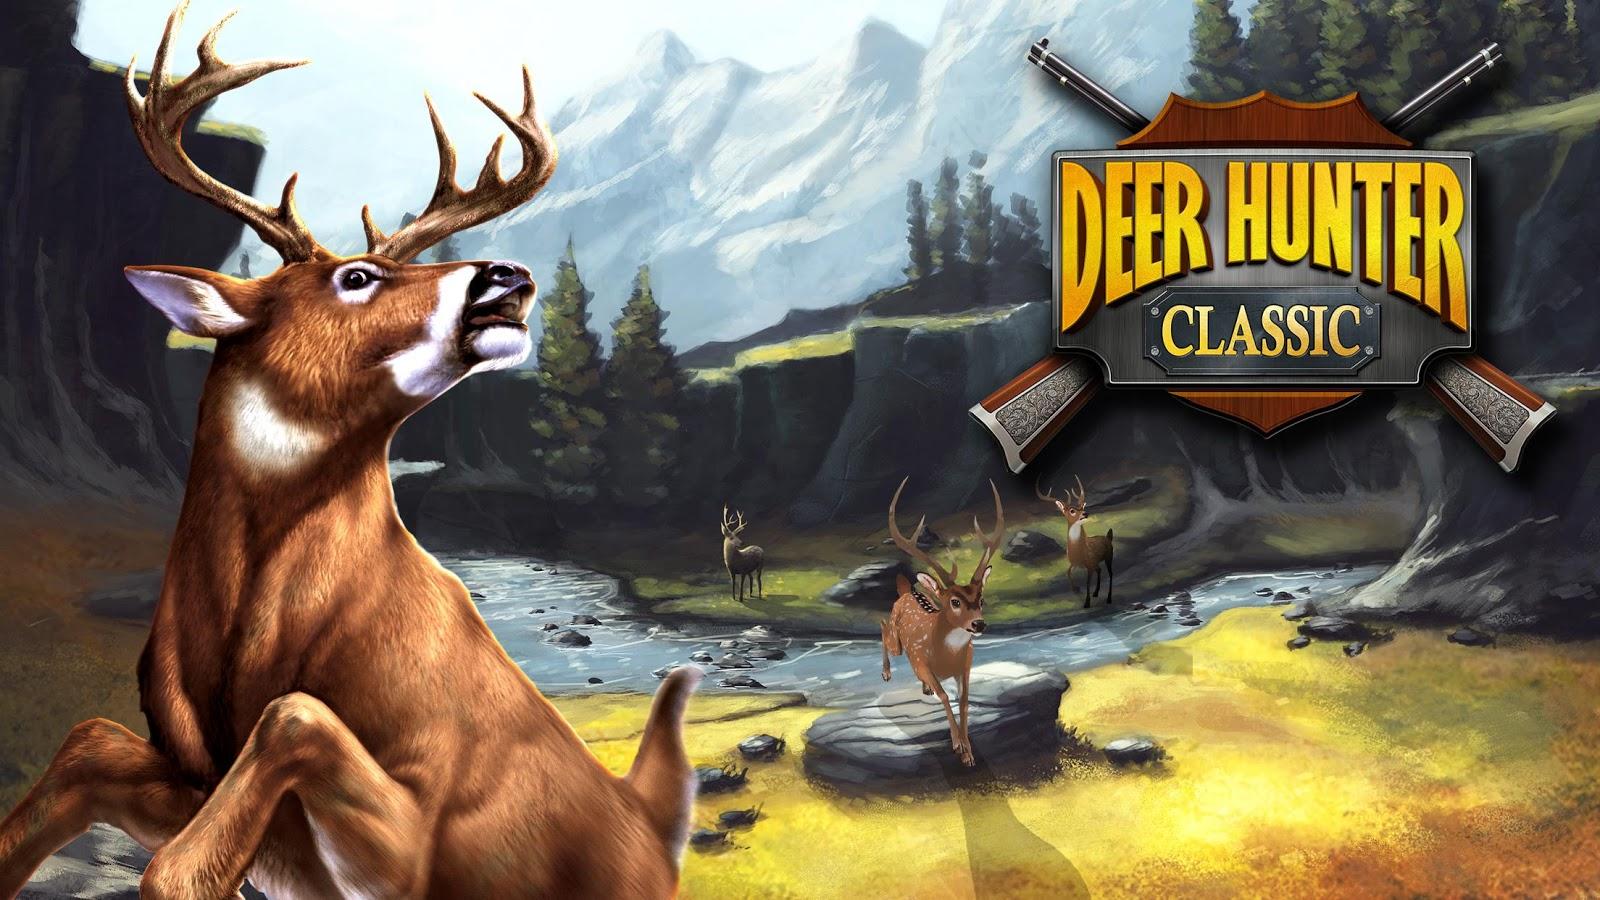 Deer Hunter 2018 for PC Free Download